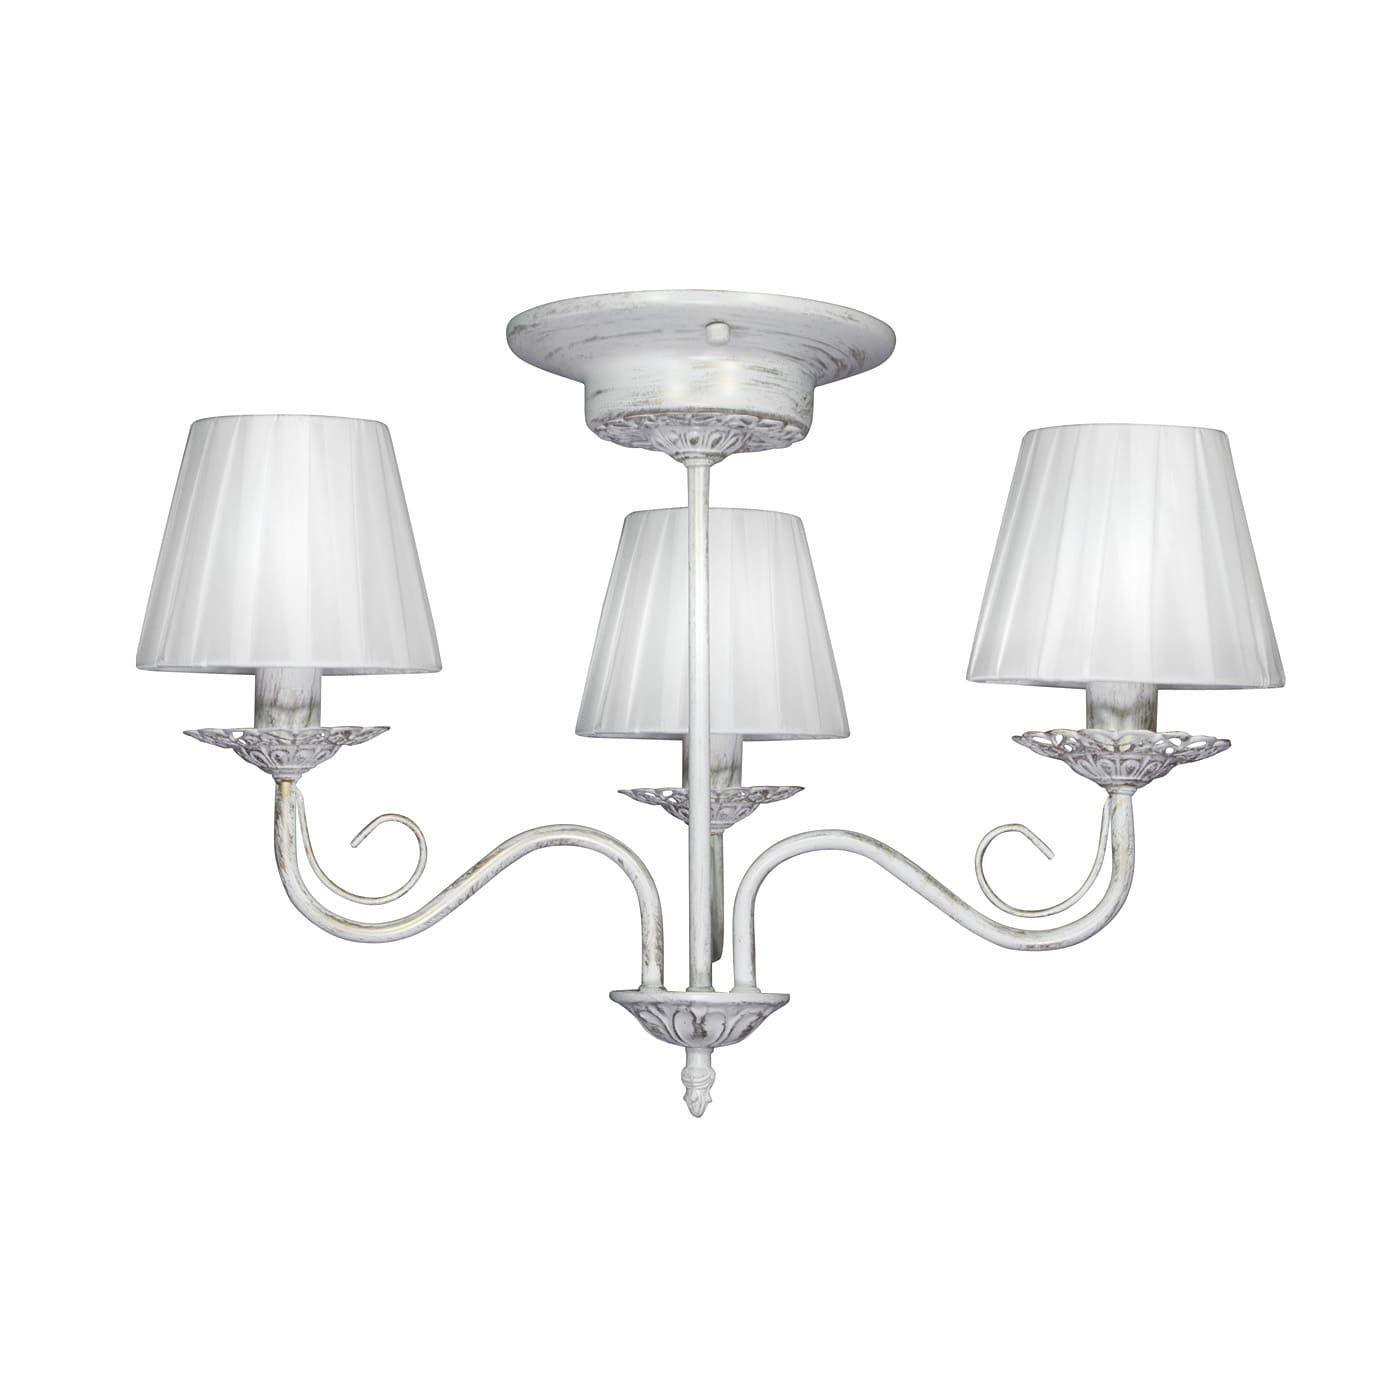 PETRASVET / Ceiling chandelier S1157-3, 3xE14 max. 60W